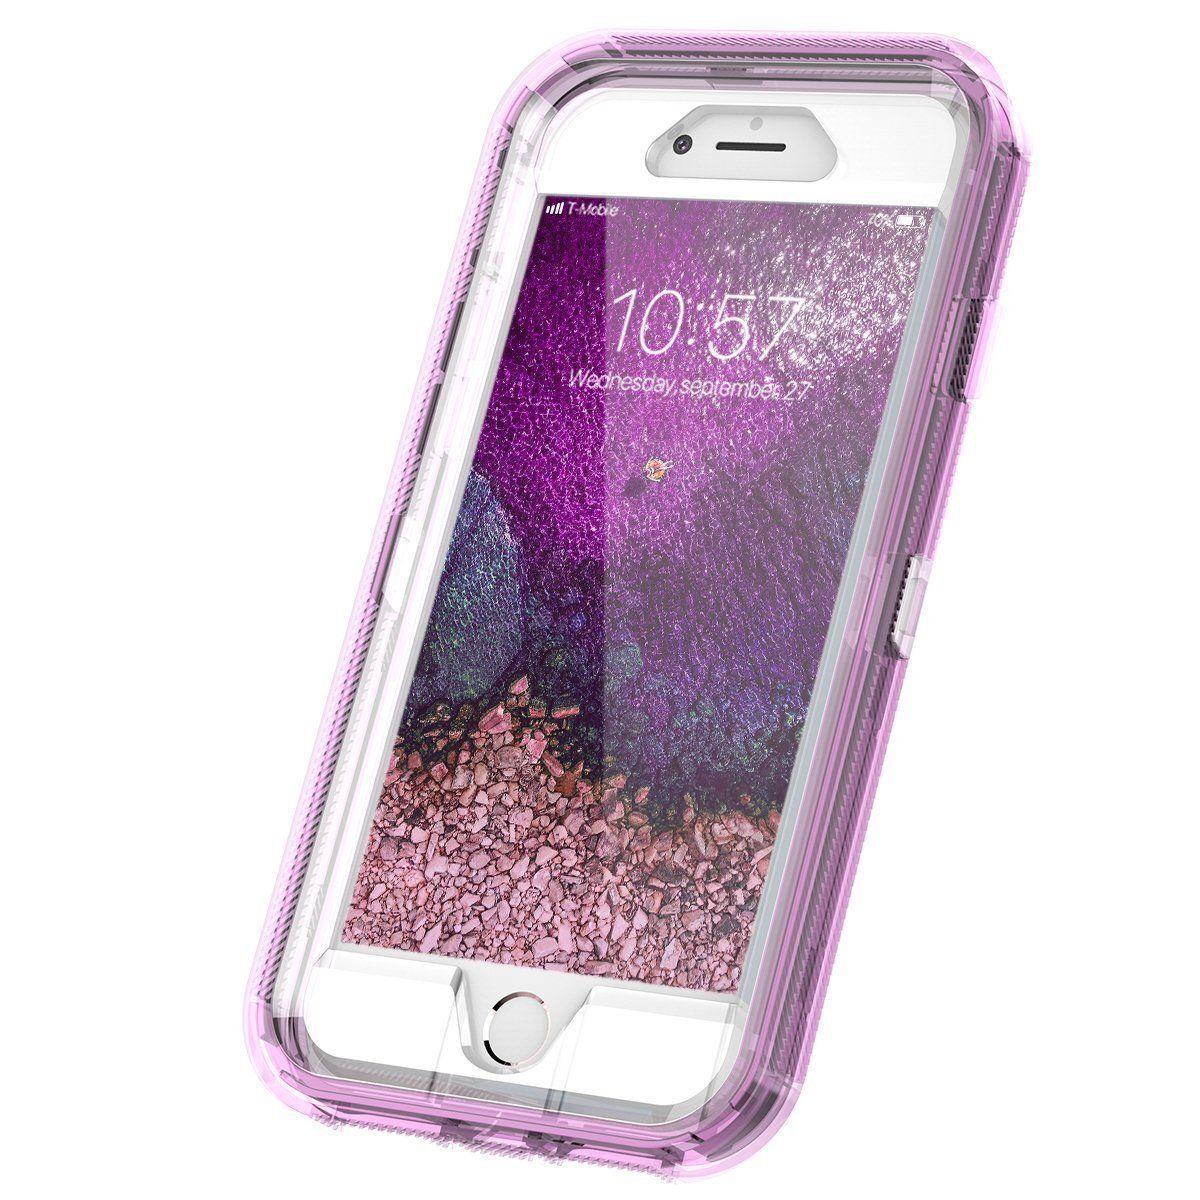 Clear Defender Transparent Case Cover iPhone 6 6S 7 8 X Plus Clip fits Otterbox